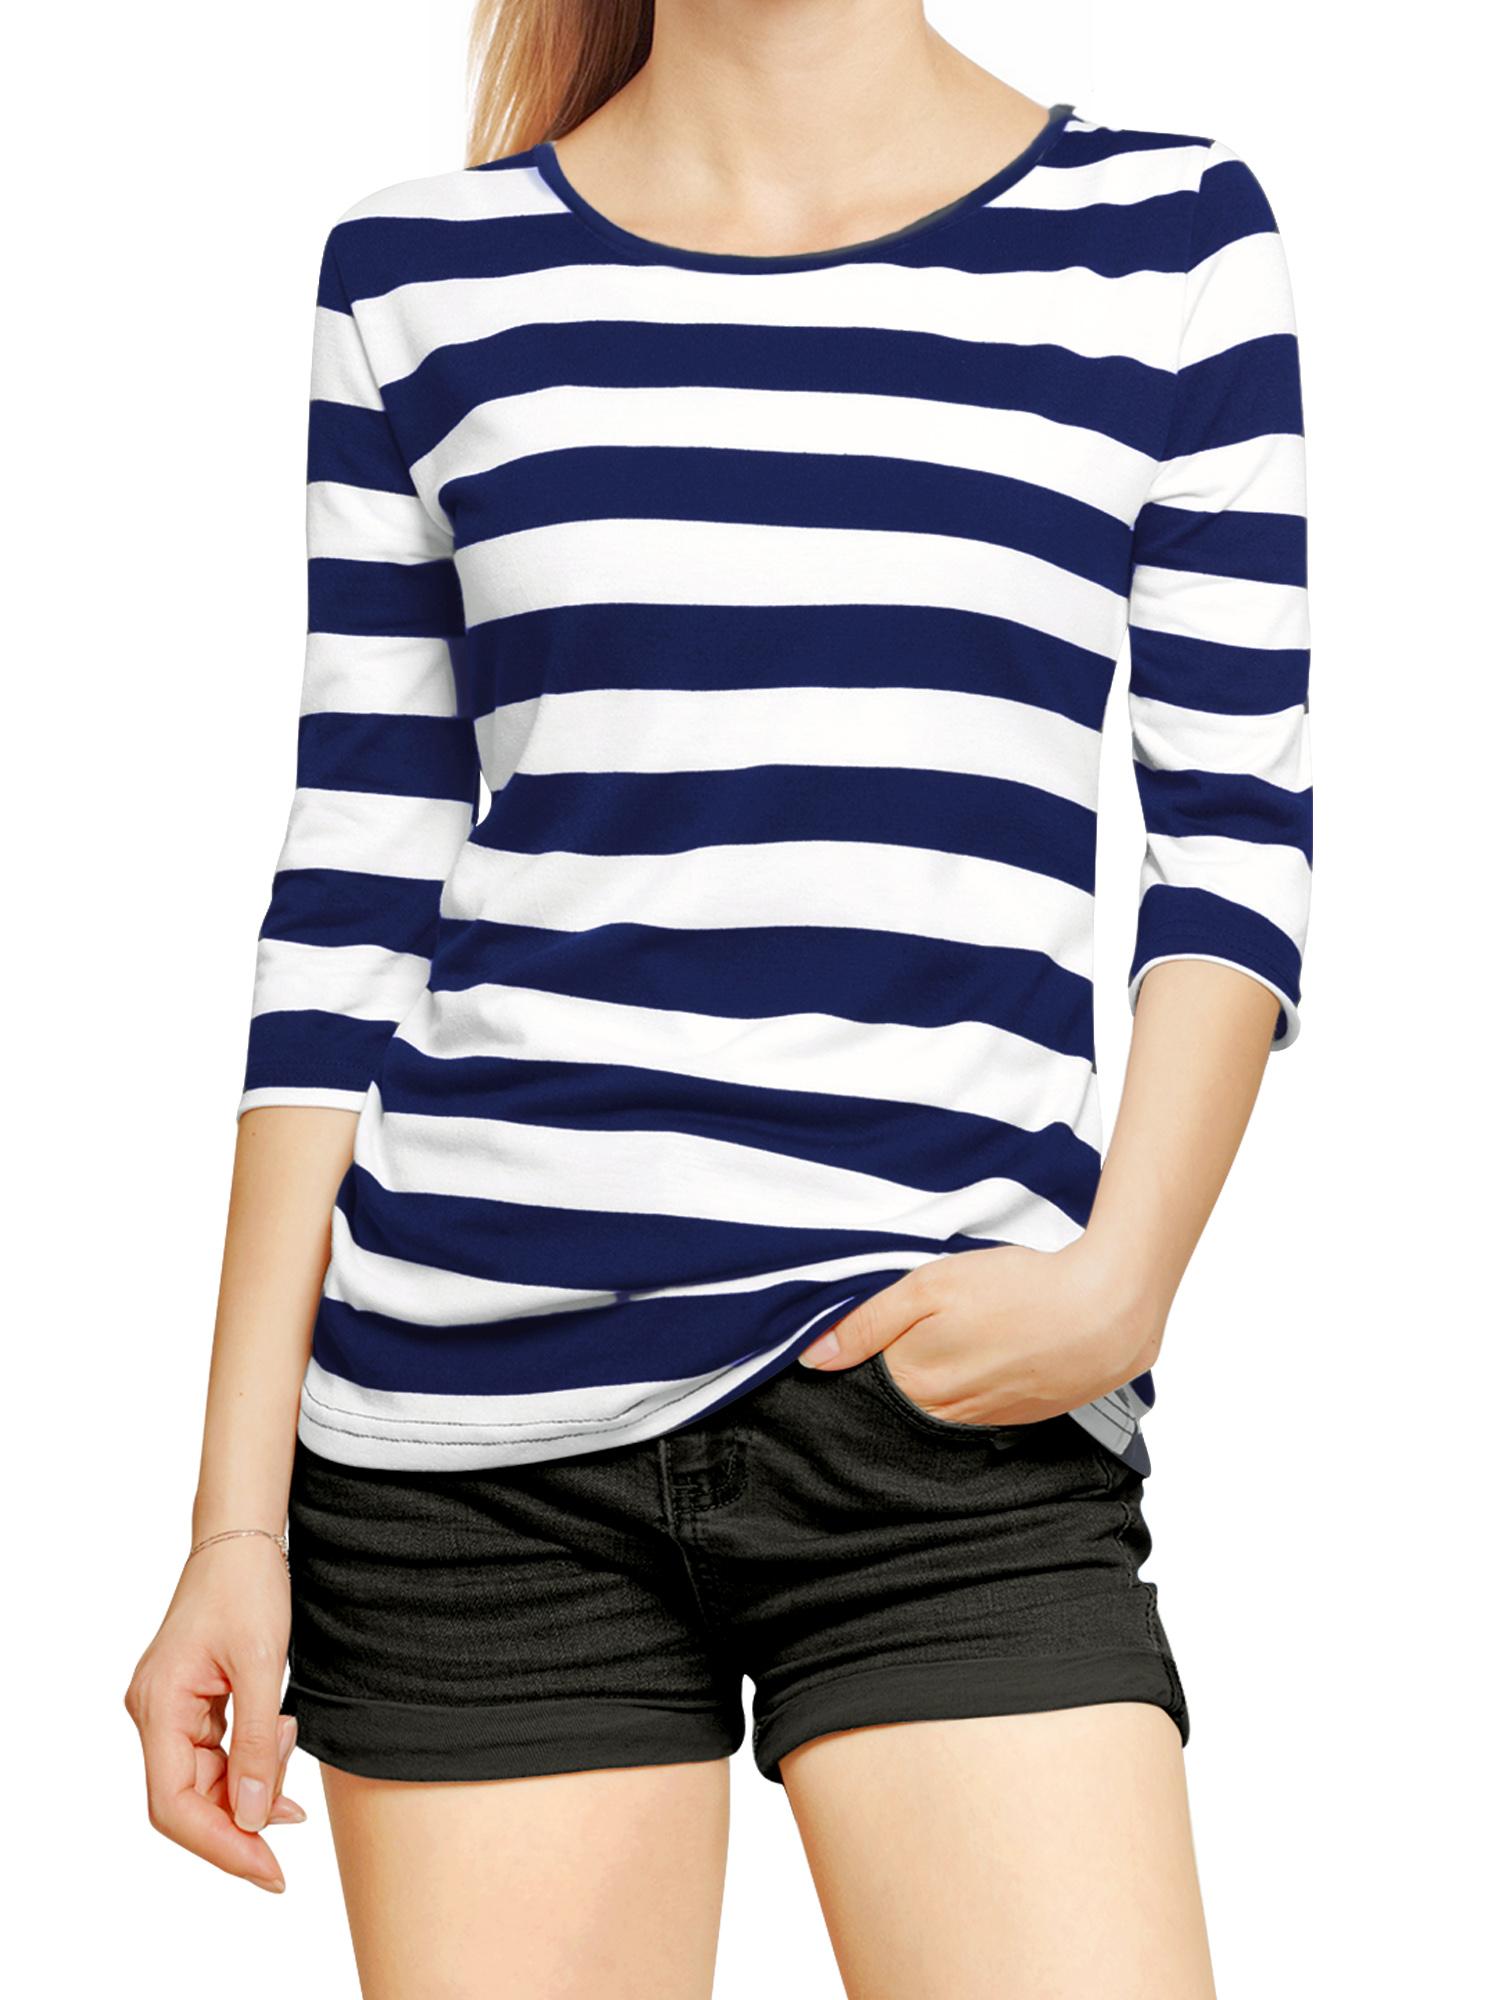 Women Half Length Sleeves Boat Neck Bold Striped Top Dark Blue White XL